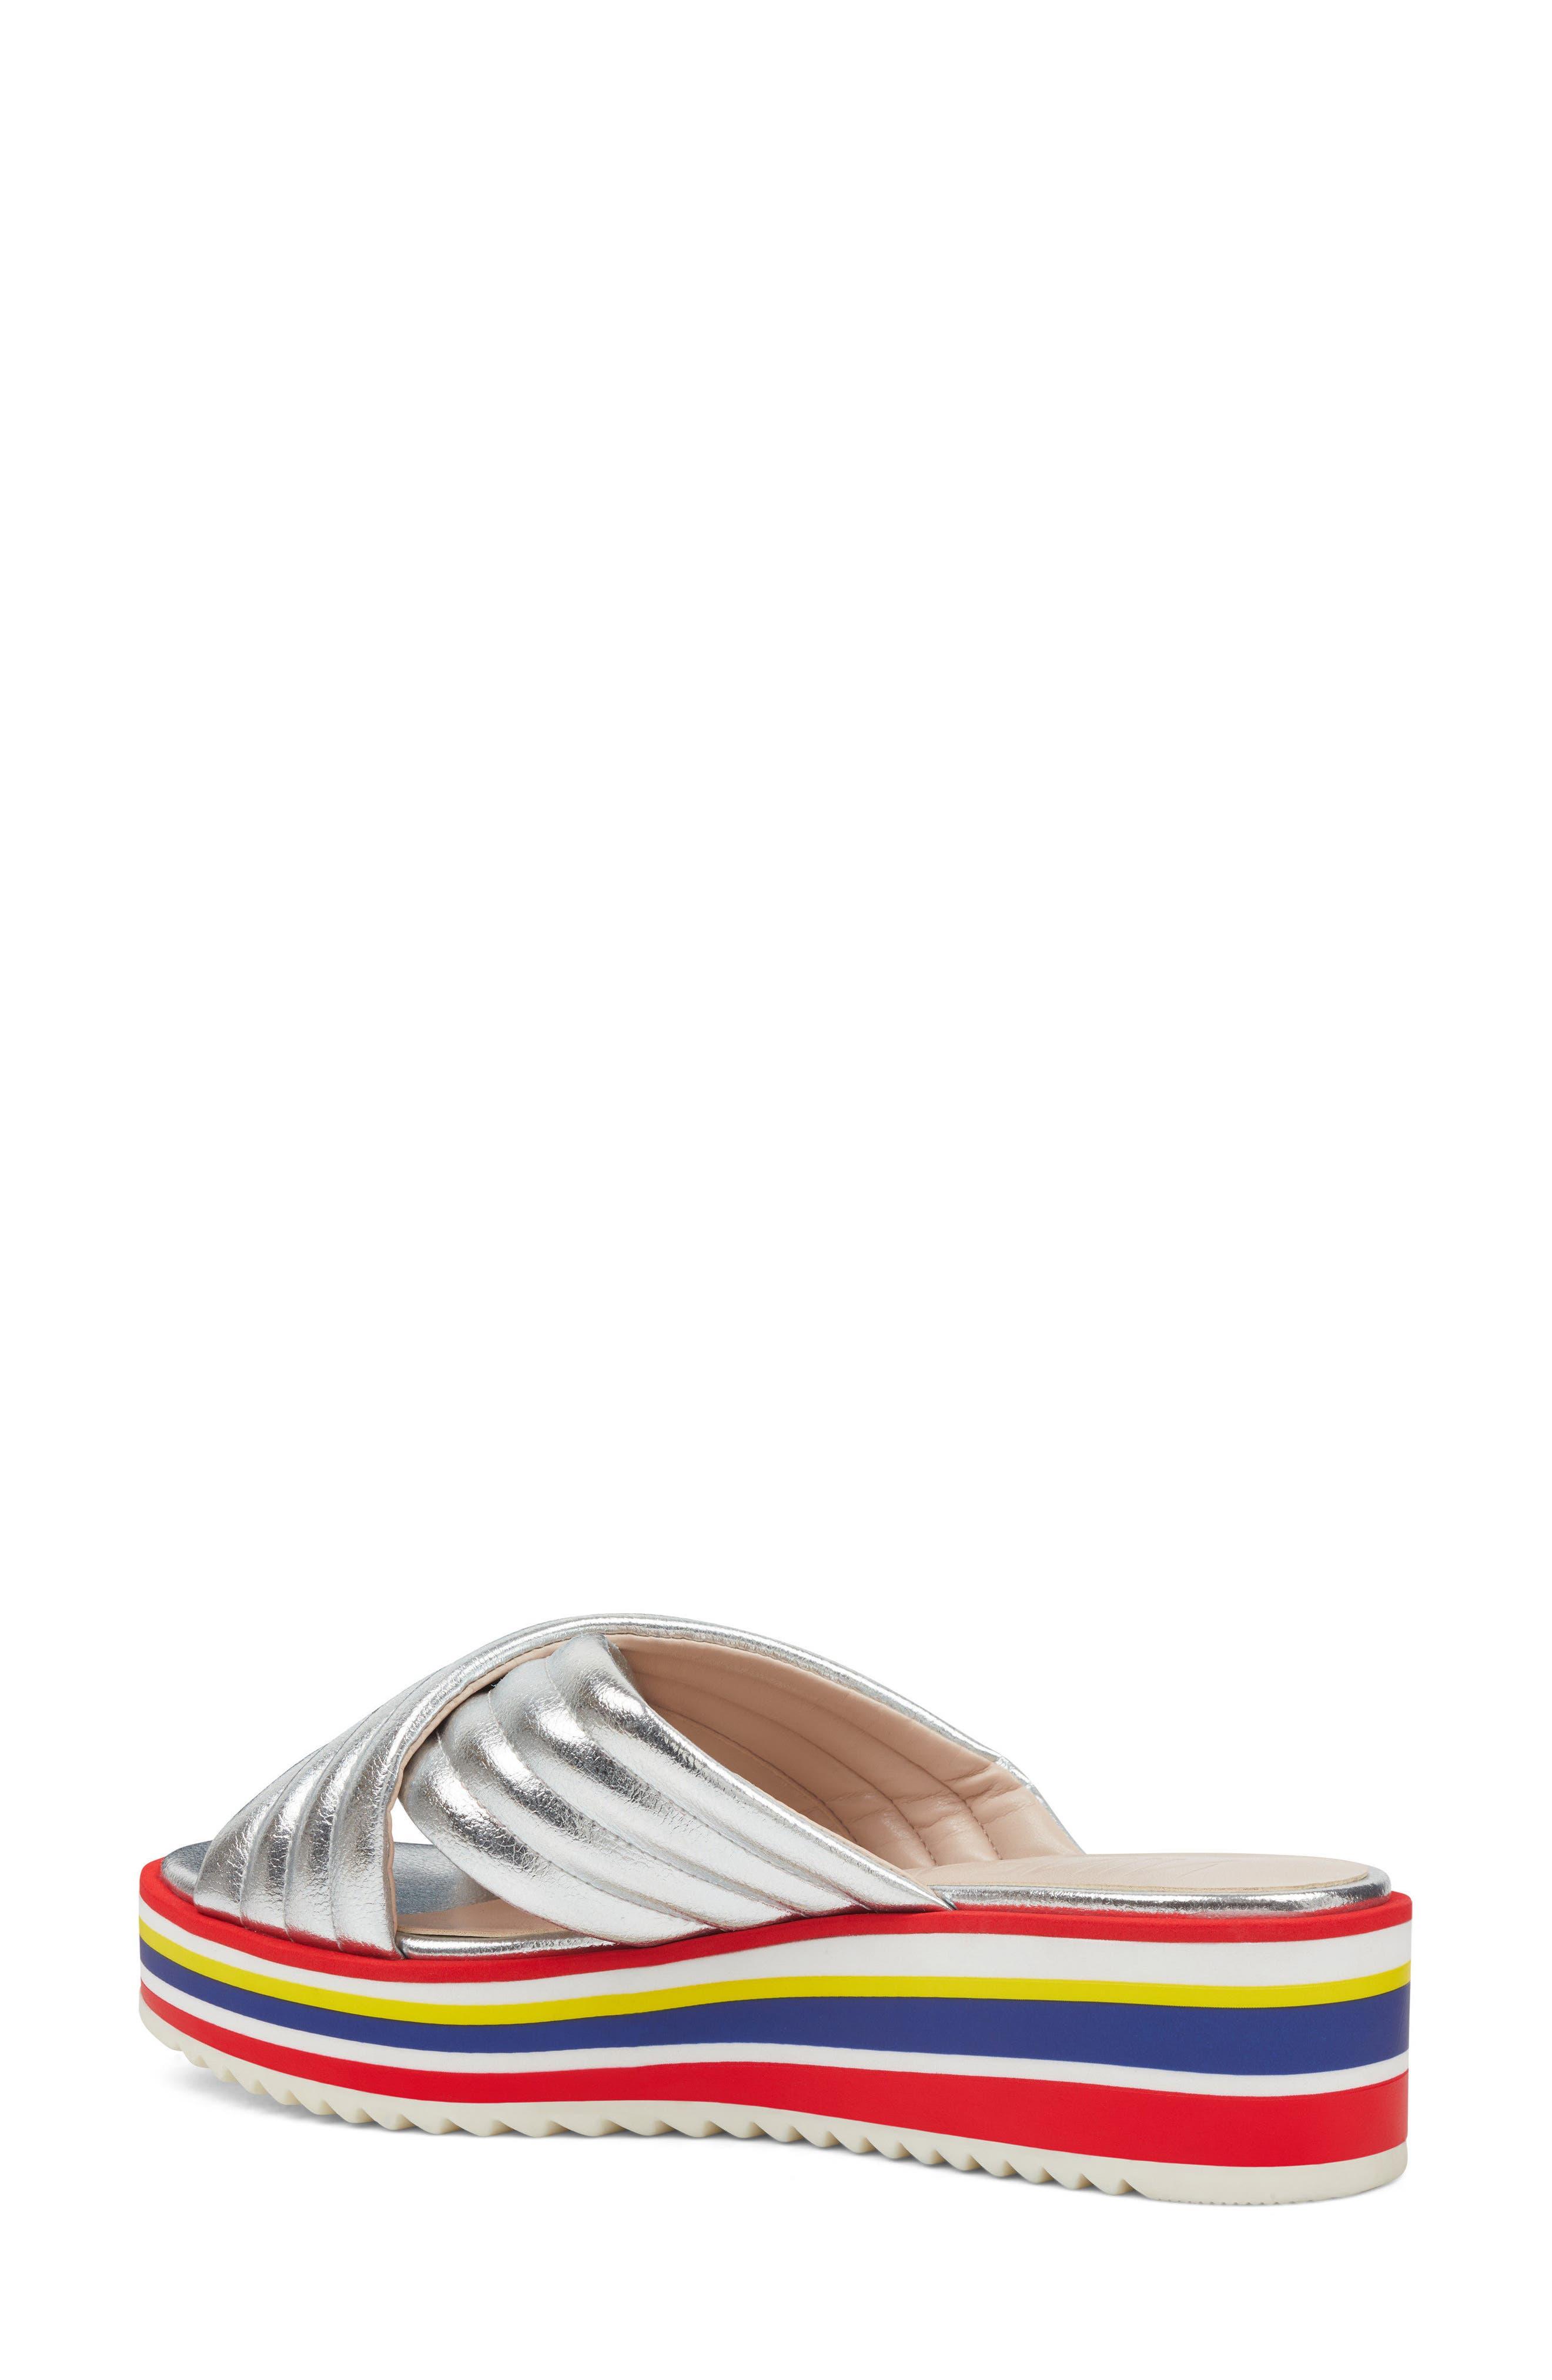 Zonita Platform Slide Sandal,                             Alternate thumbnail 2, color,                             Silver Faux Leather